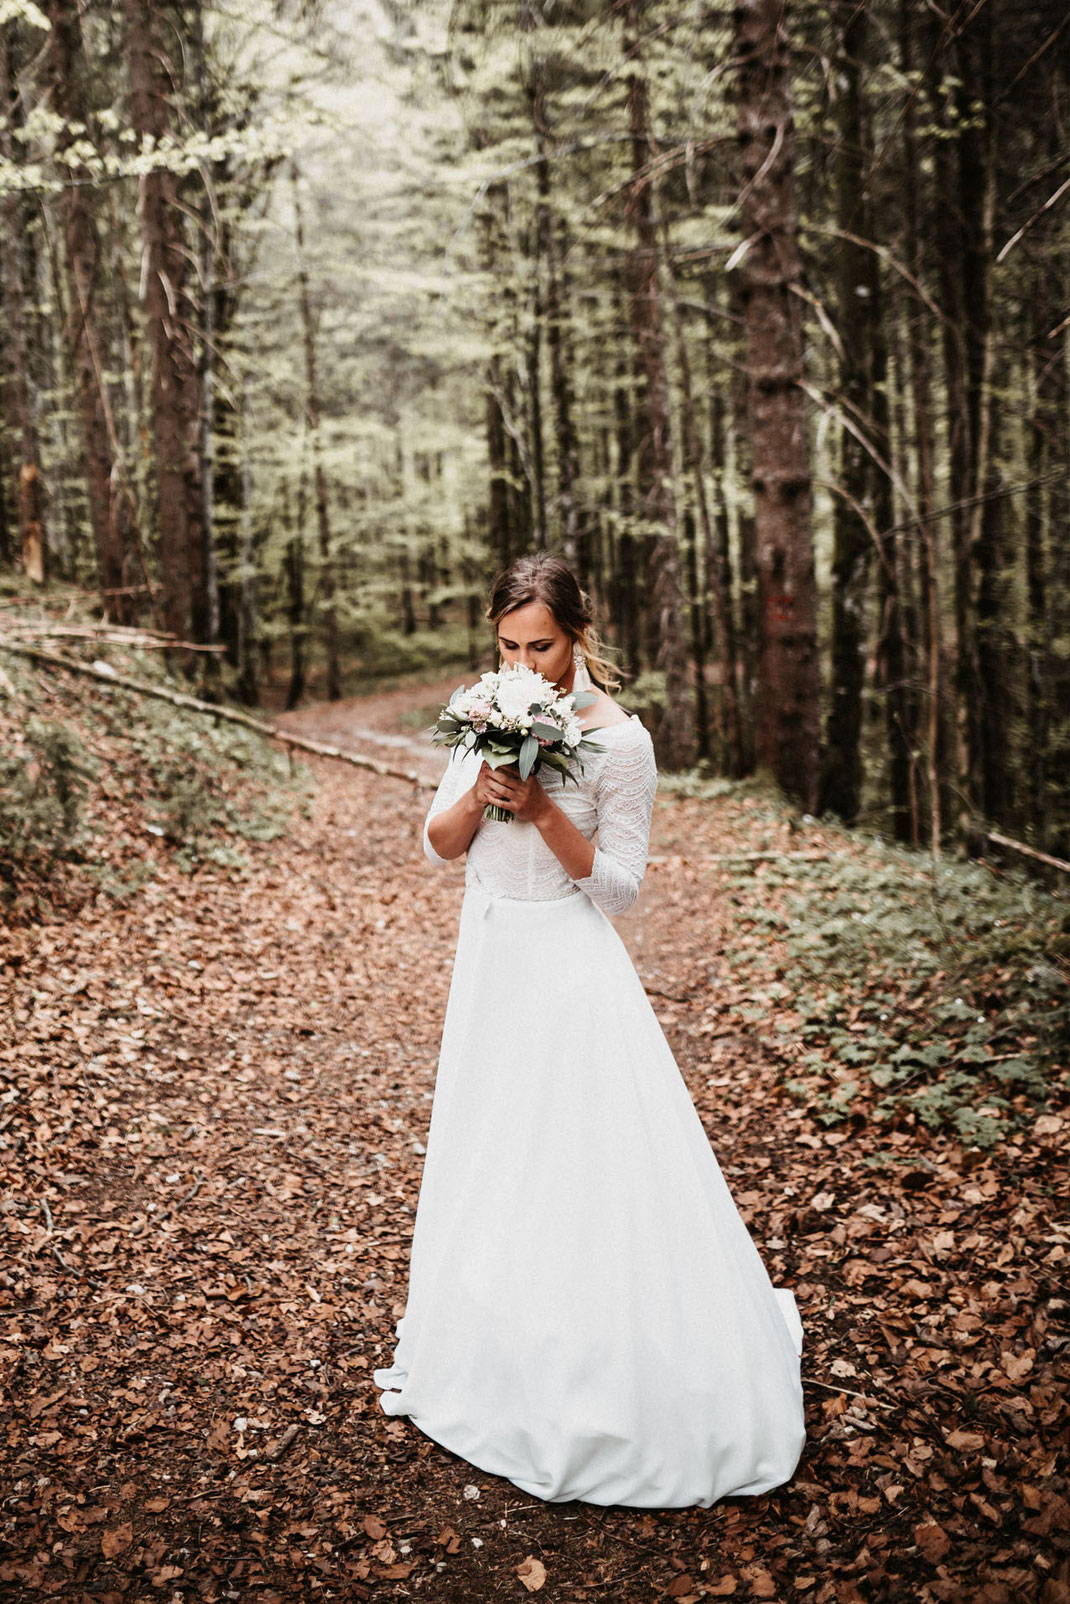 Brautkleid Whispers of love by Tali Amoo fotografiert von Anna Lohninger in Tegernsee.